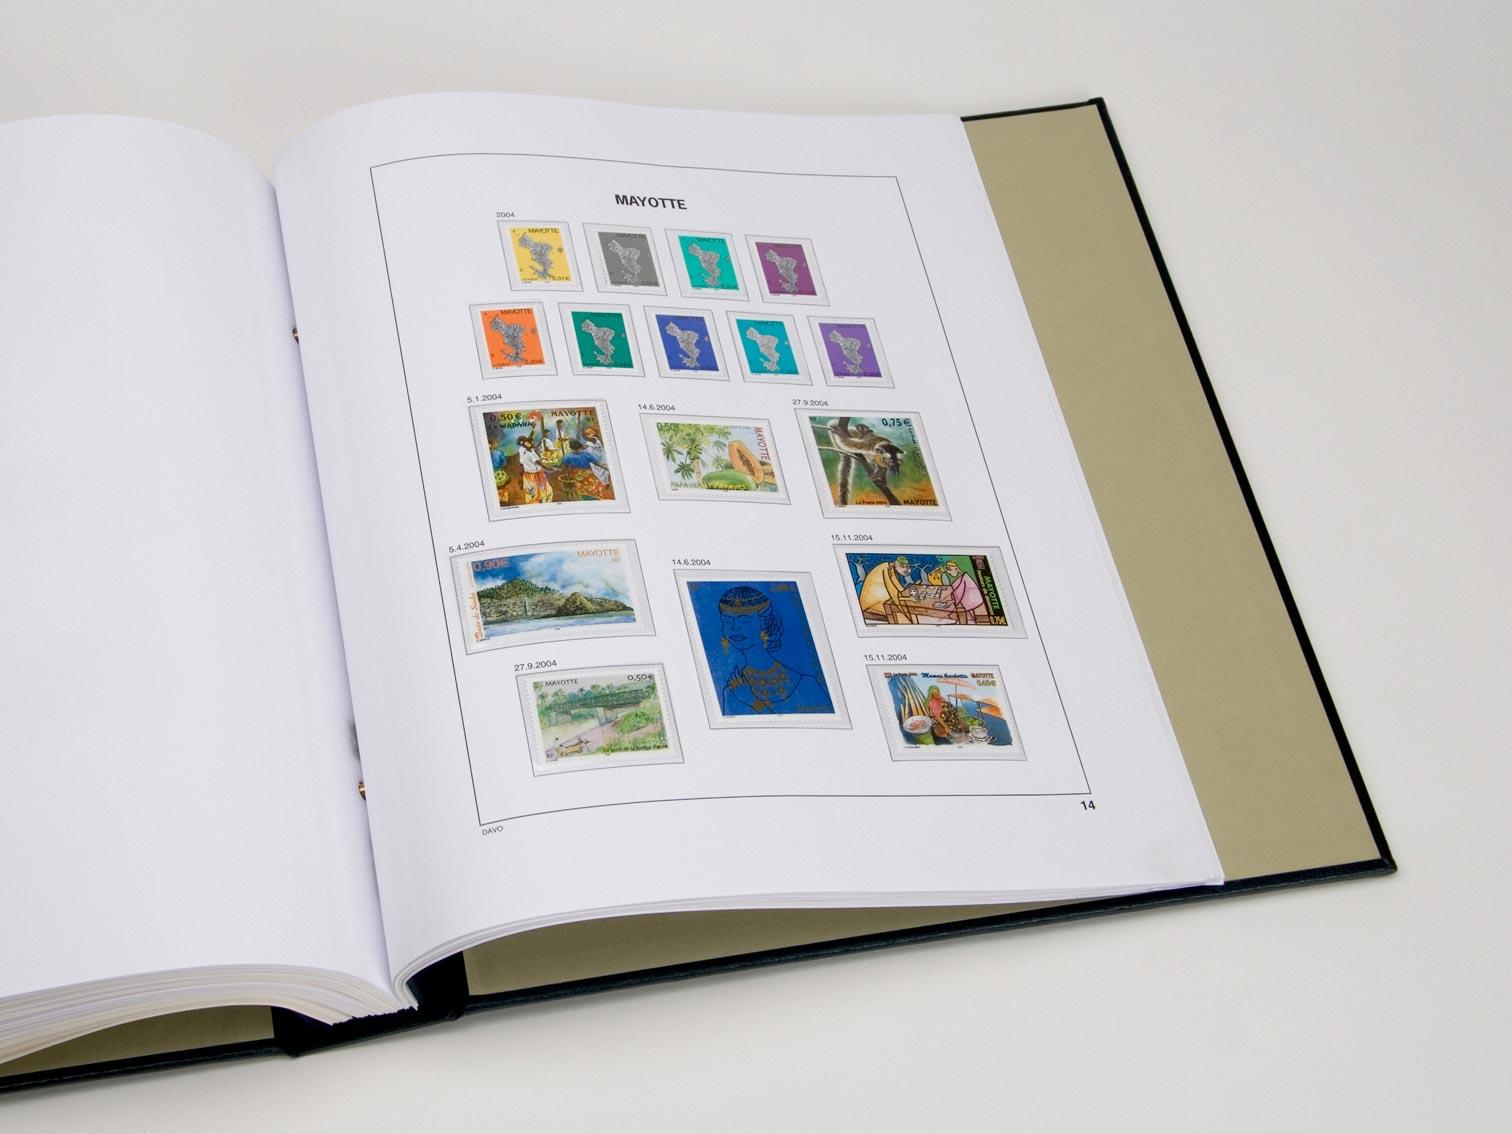 Mayotte Luxe Album Volume 1 1997-2011